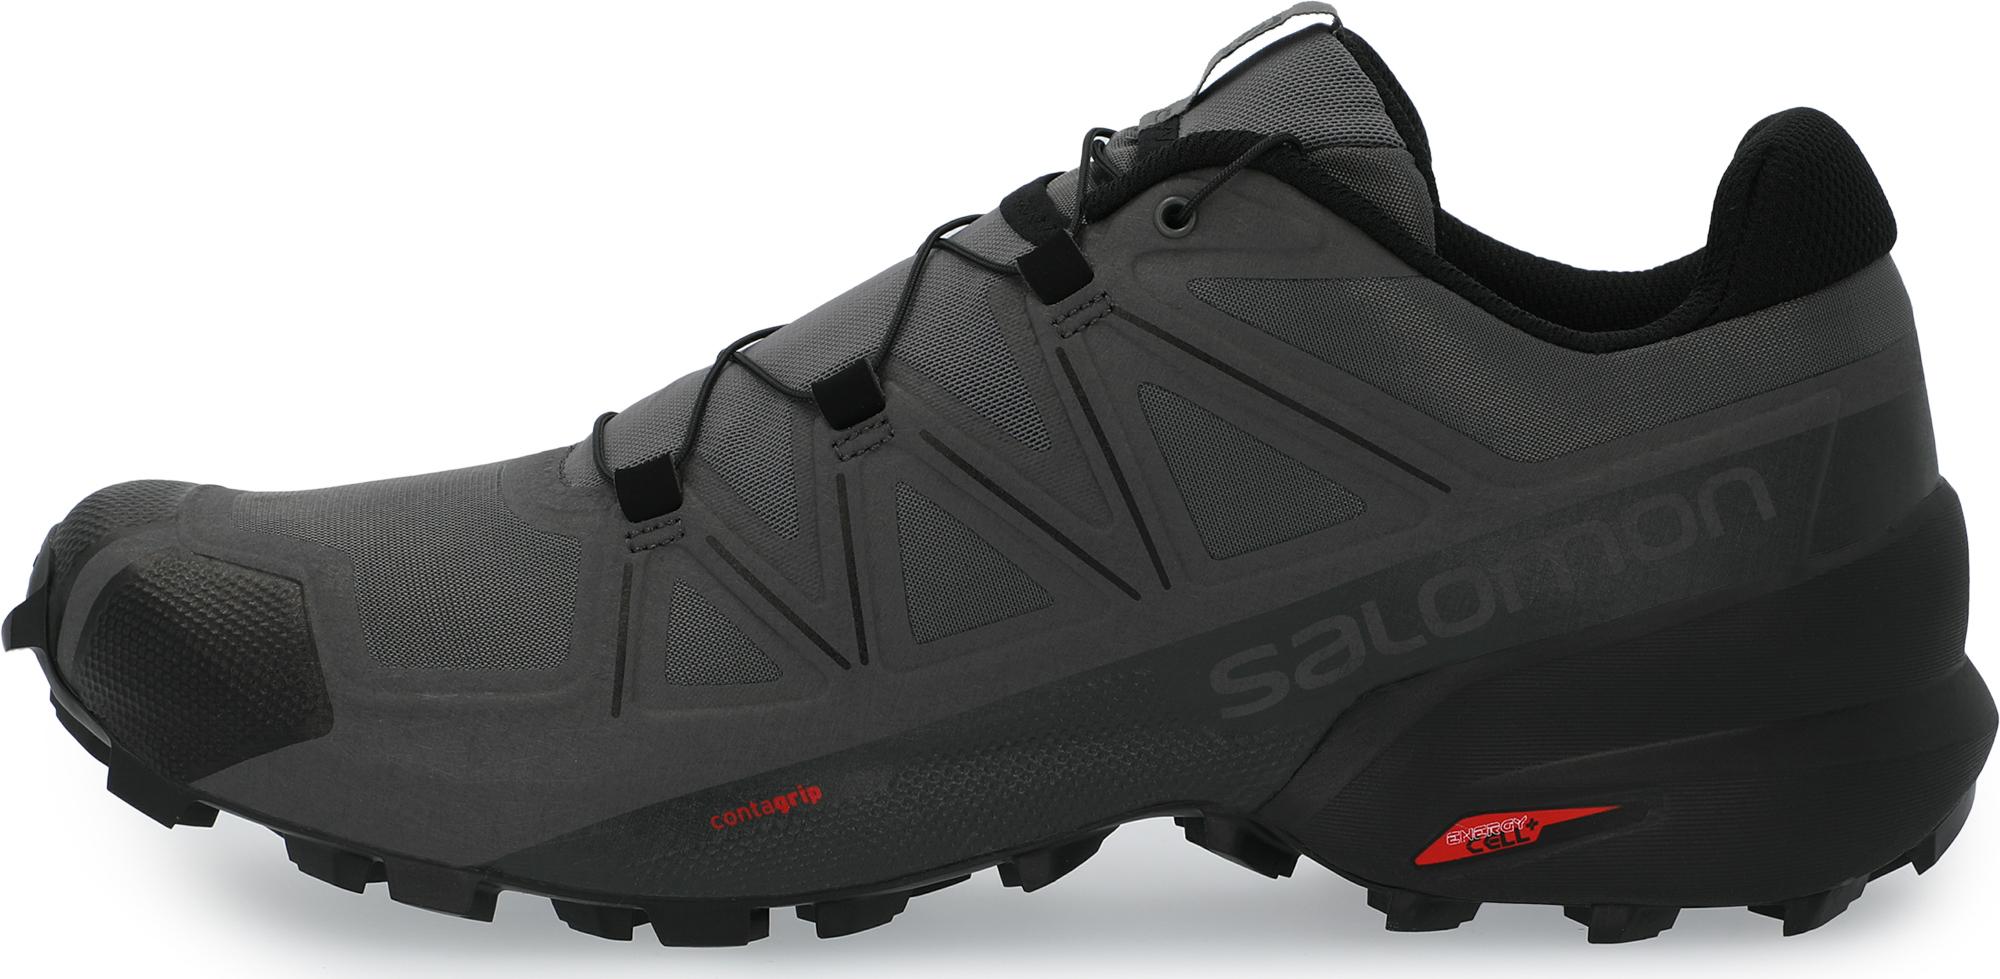 цена на Salomon Кроссовки мужские Salomon Speedcross 5, размер 44